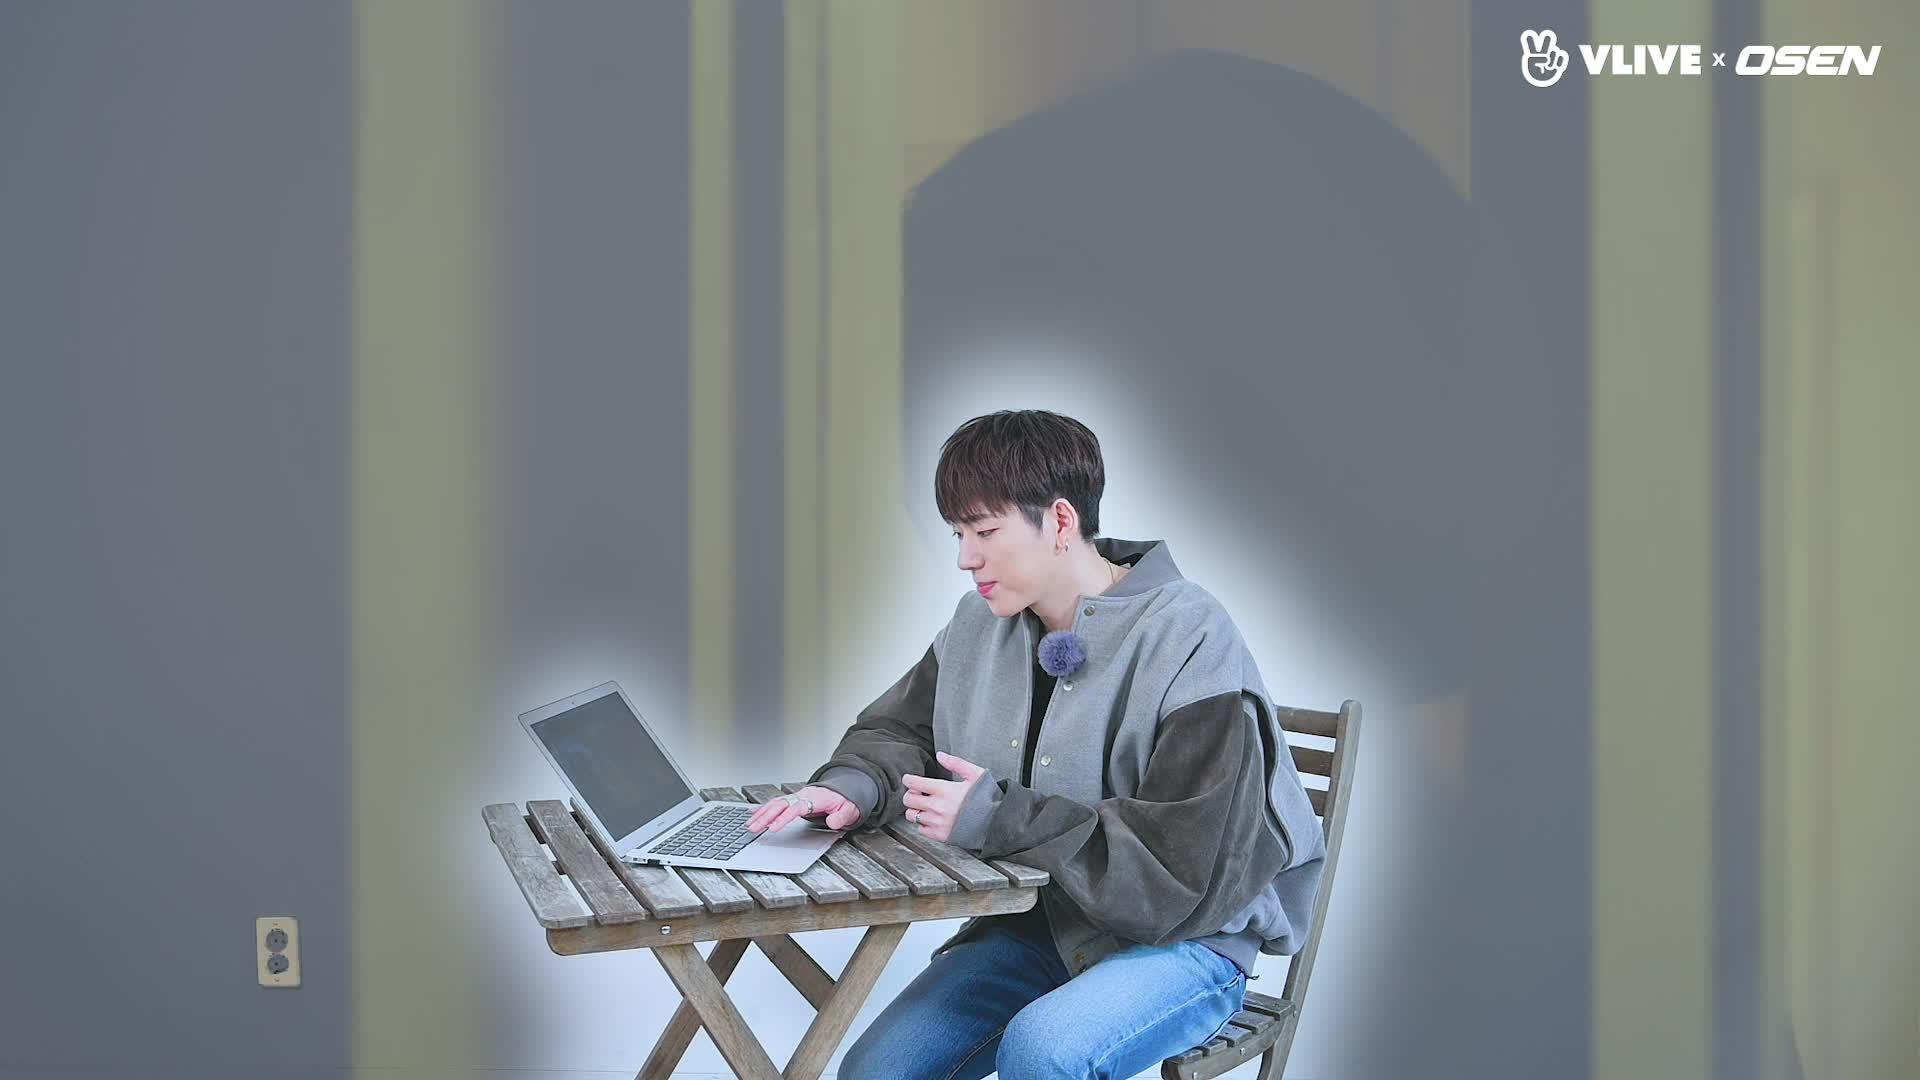 ZICO 지코, '남겨짐에 대해' MV 코멘터리 #스타로드 02